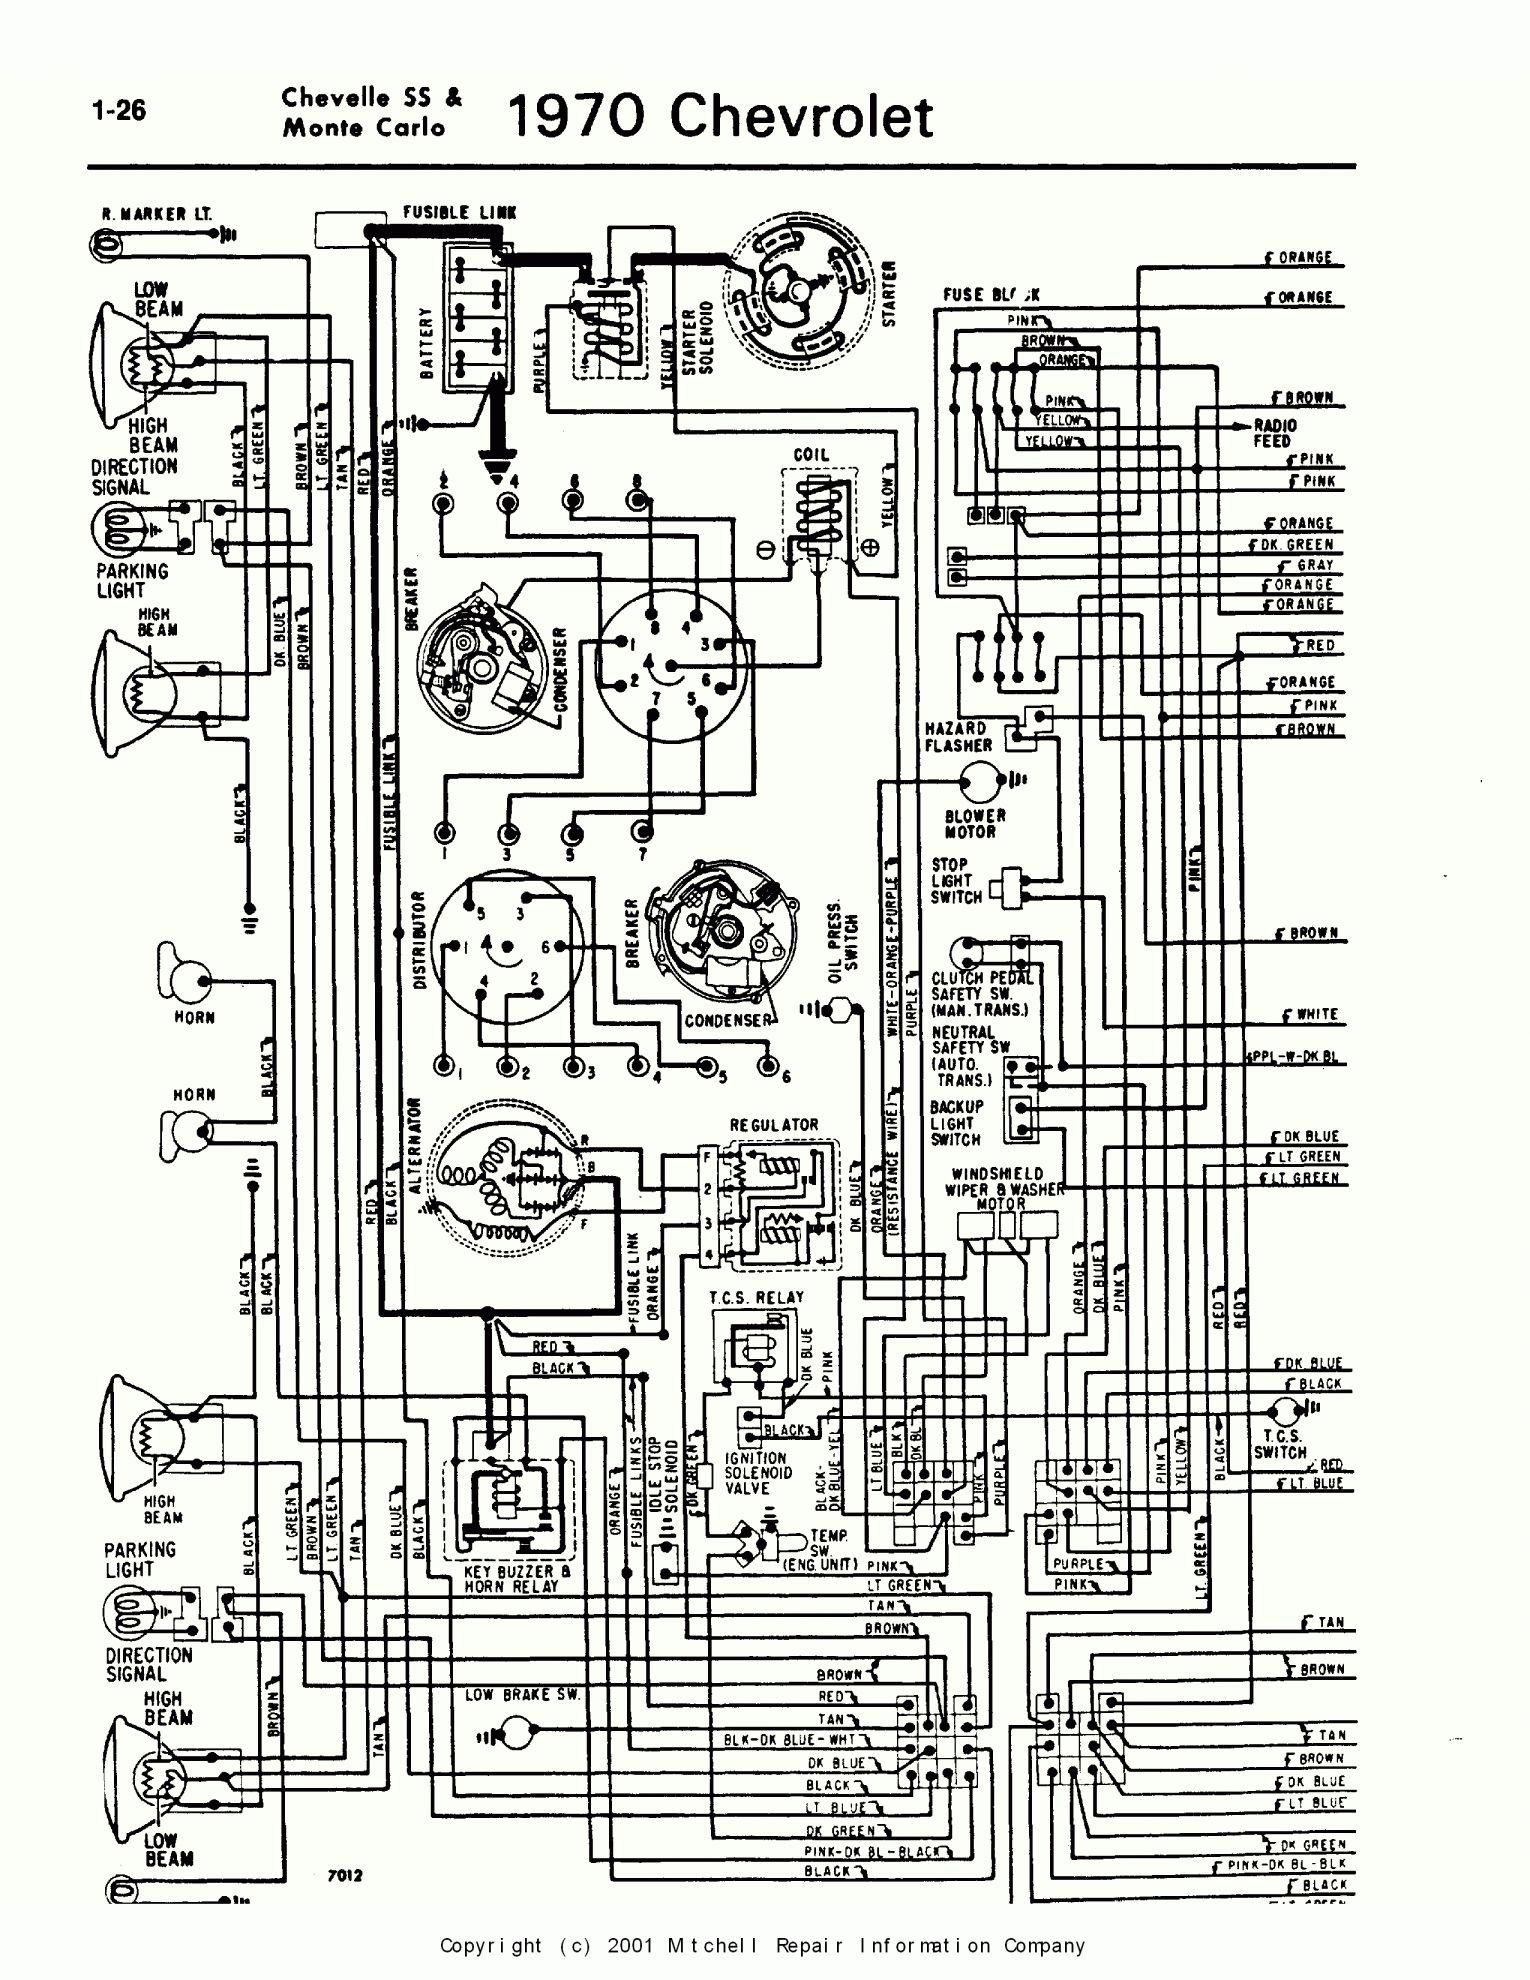 Truck Diagram Wiringg Net 1970 Chevelle Wire Chevelle